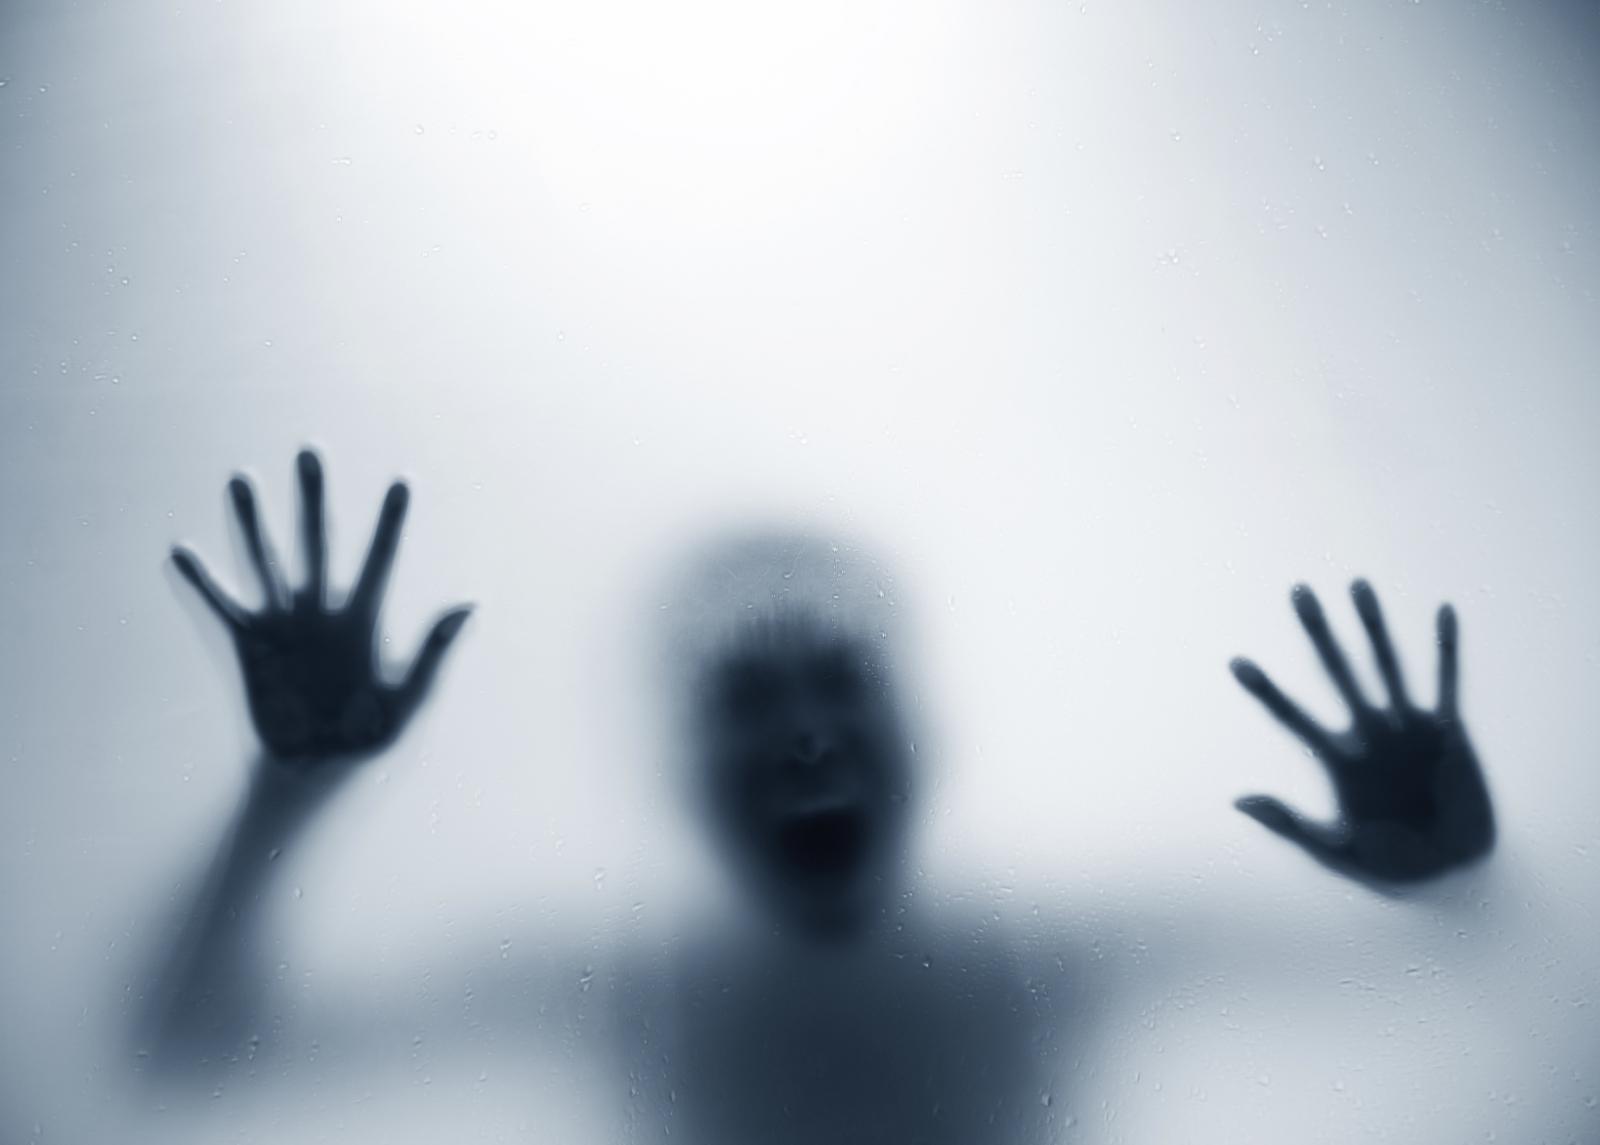 Fear, Emotional Abuse, Creepy, Stalker, Harassment